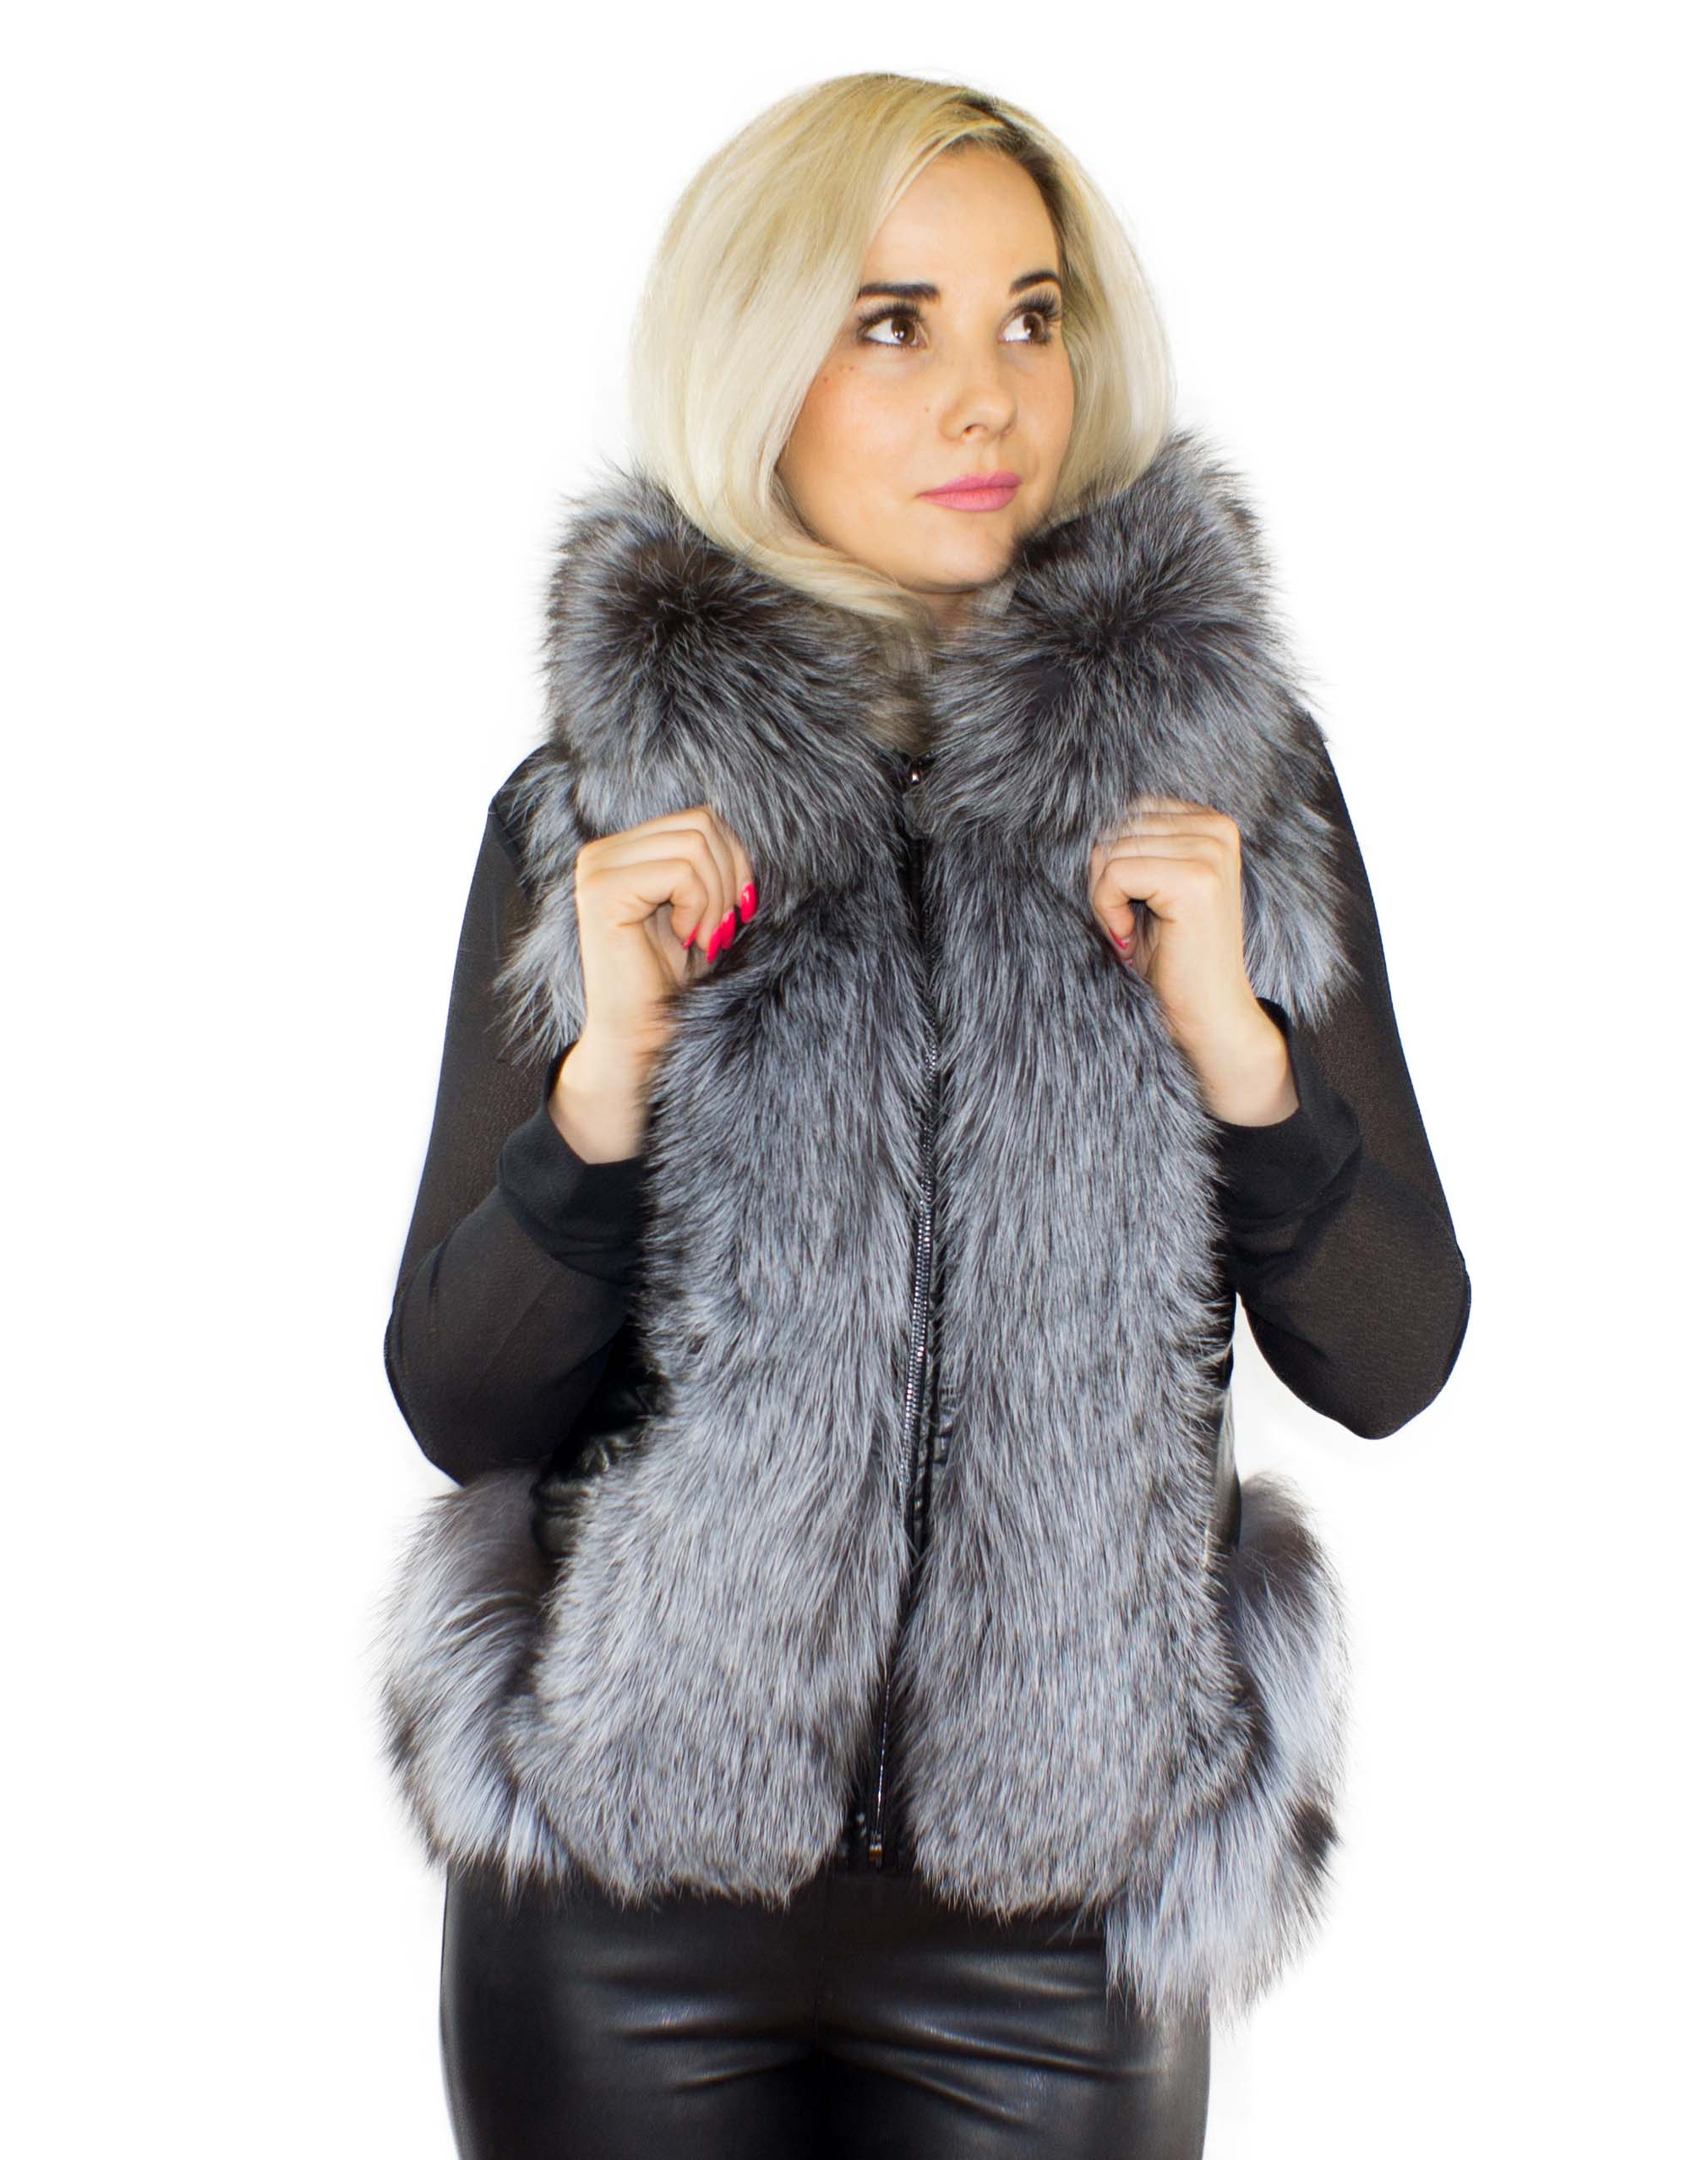 pelzwesten echtfellwesten gro e auswahl damenmode winterbekleidung fellwesten pelzchen. Black Bedroom Furniture Sets. Home Design Ideas